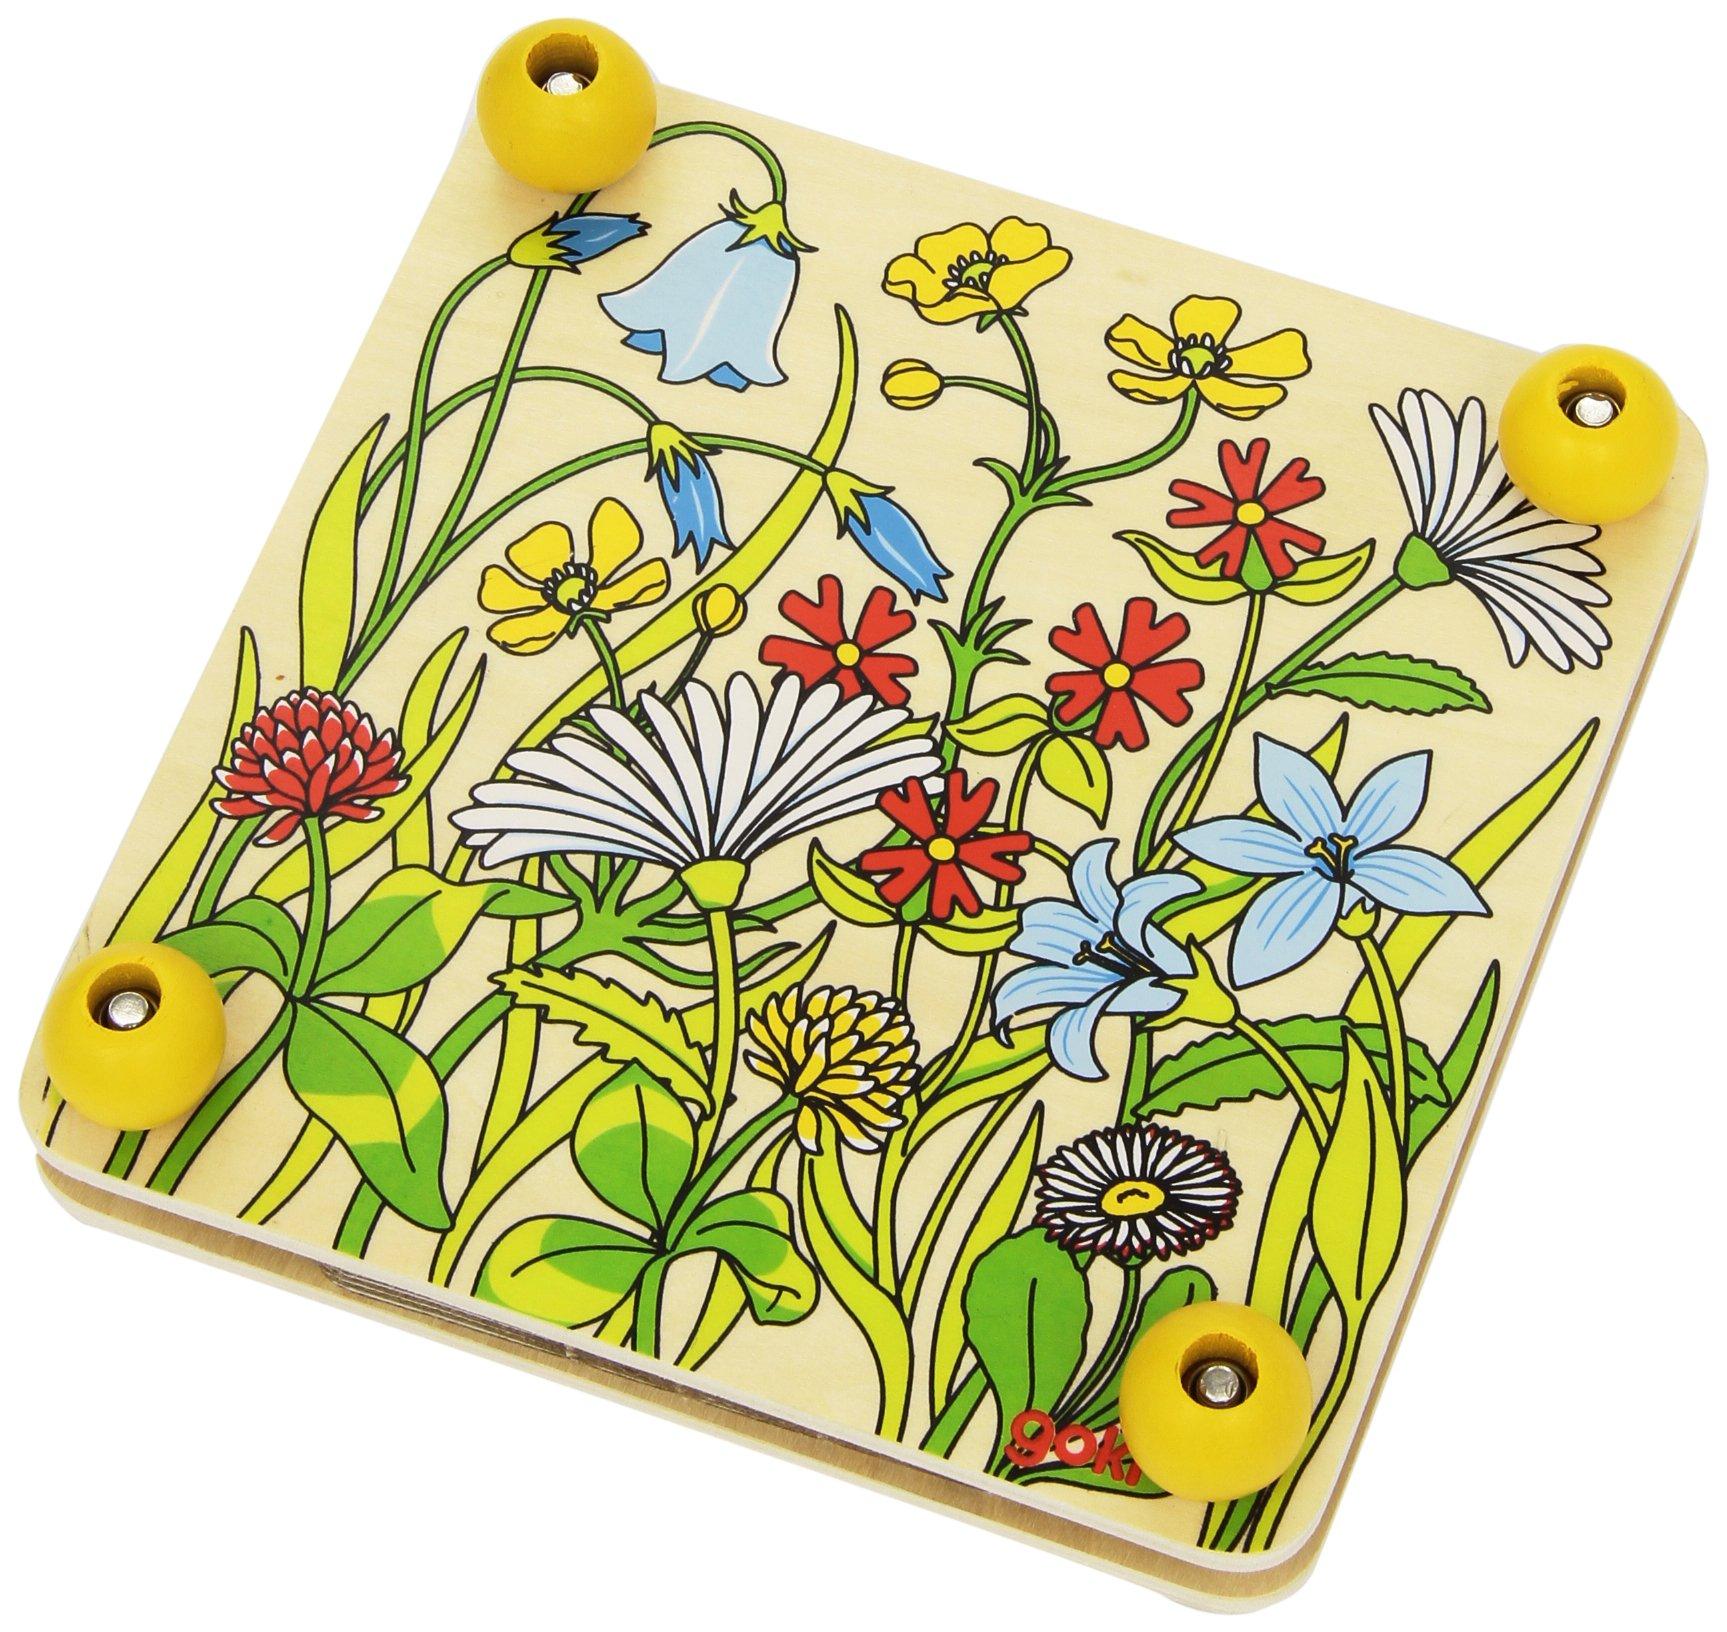 Flower Press Spring Meadow Game by Goki